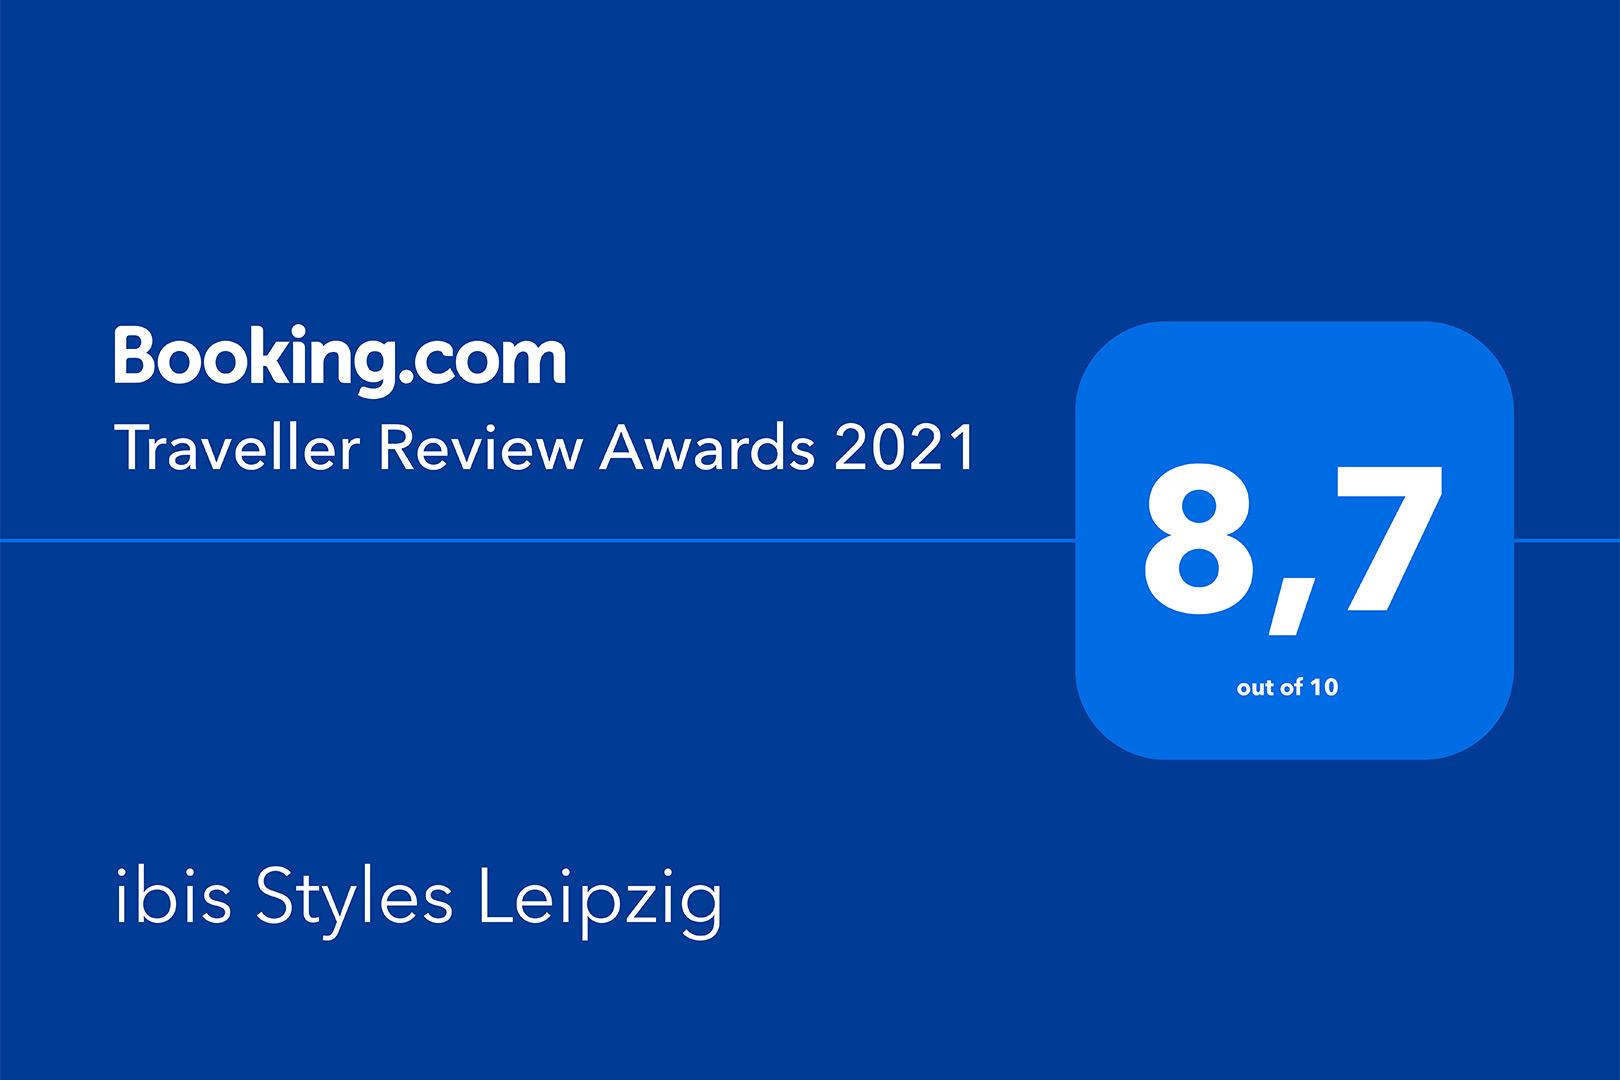 ibis Styles Leipzig - Traveller Review Award 2021